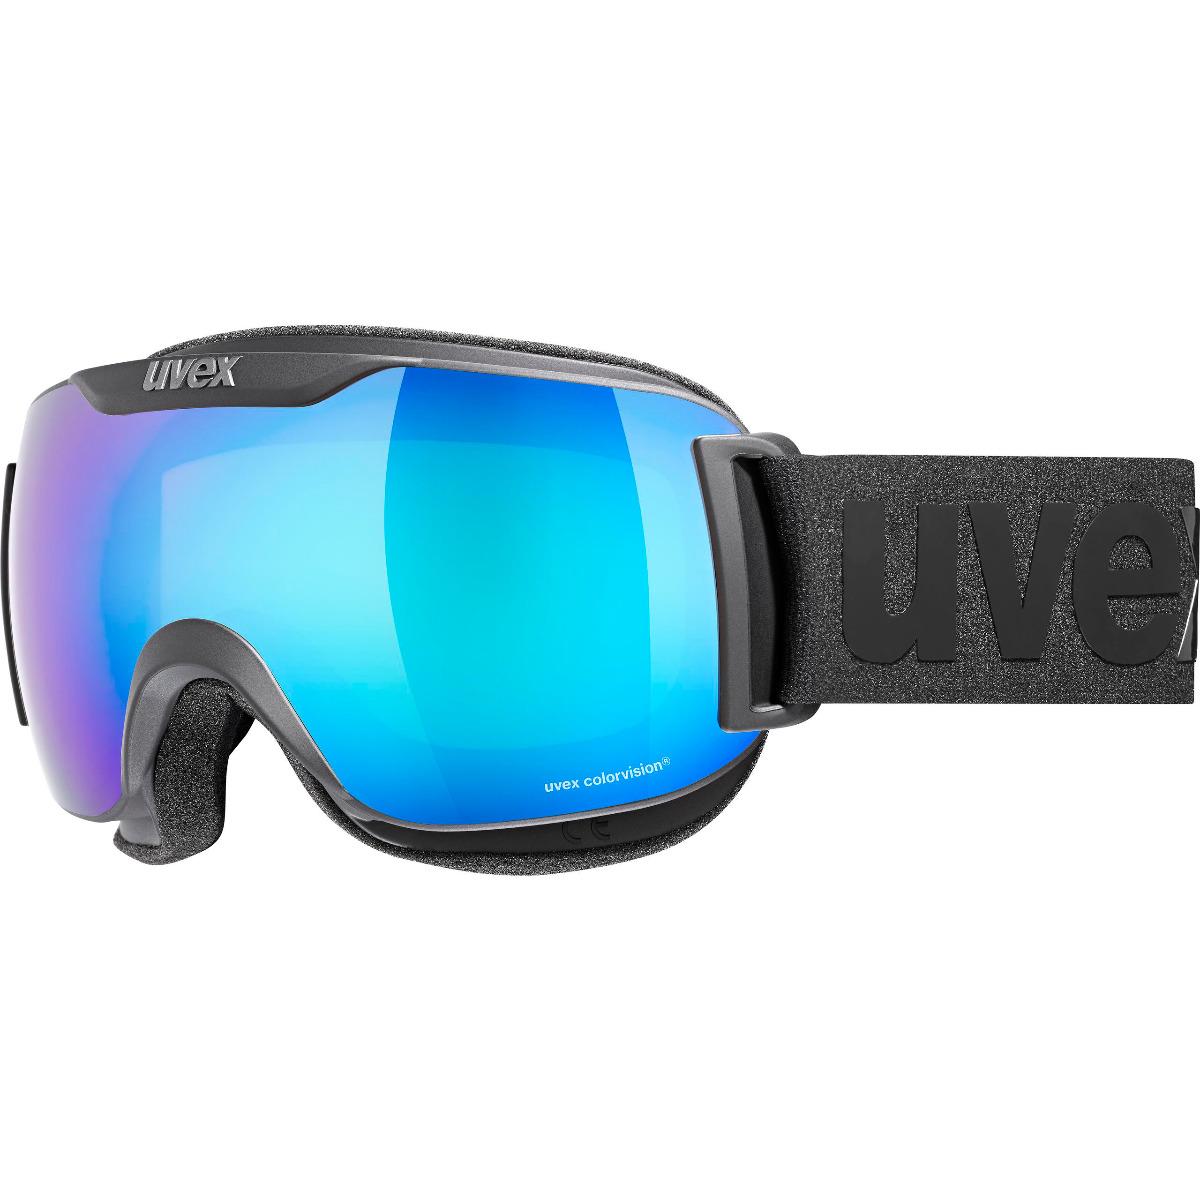 Produktbild UVEX DH 2000 S Downhill